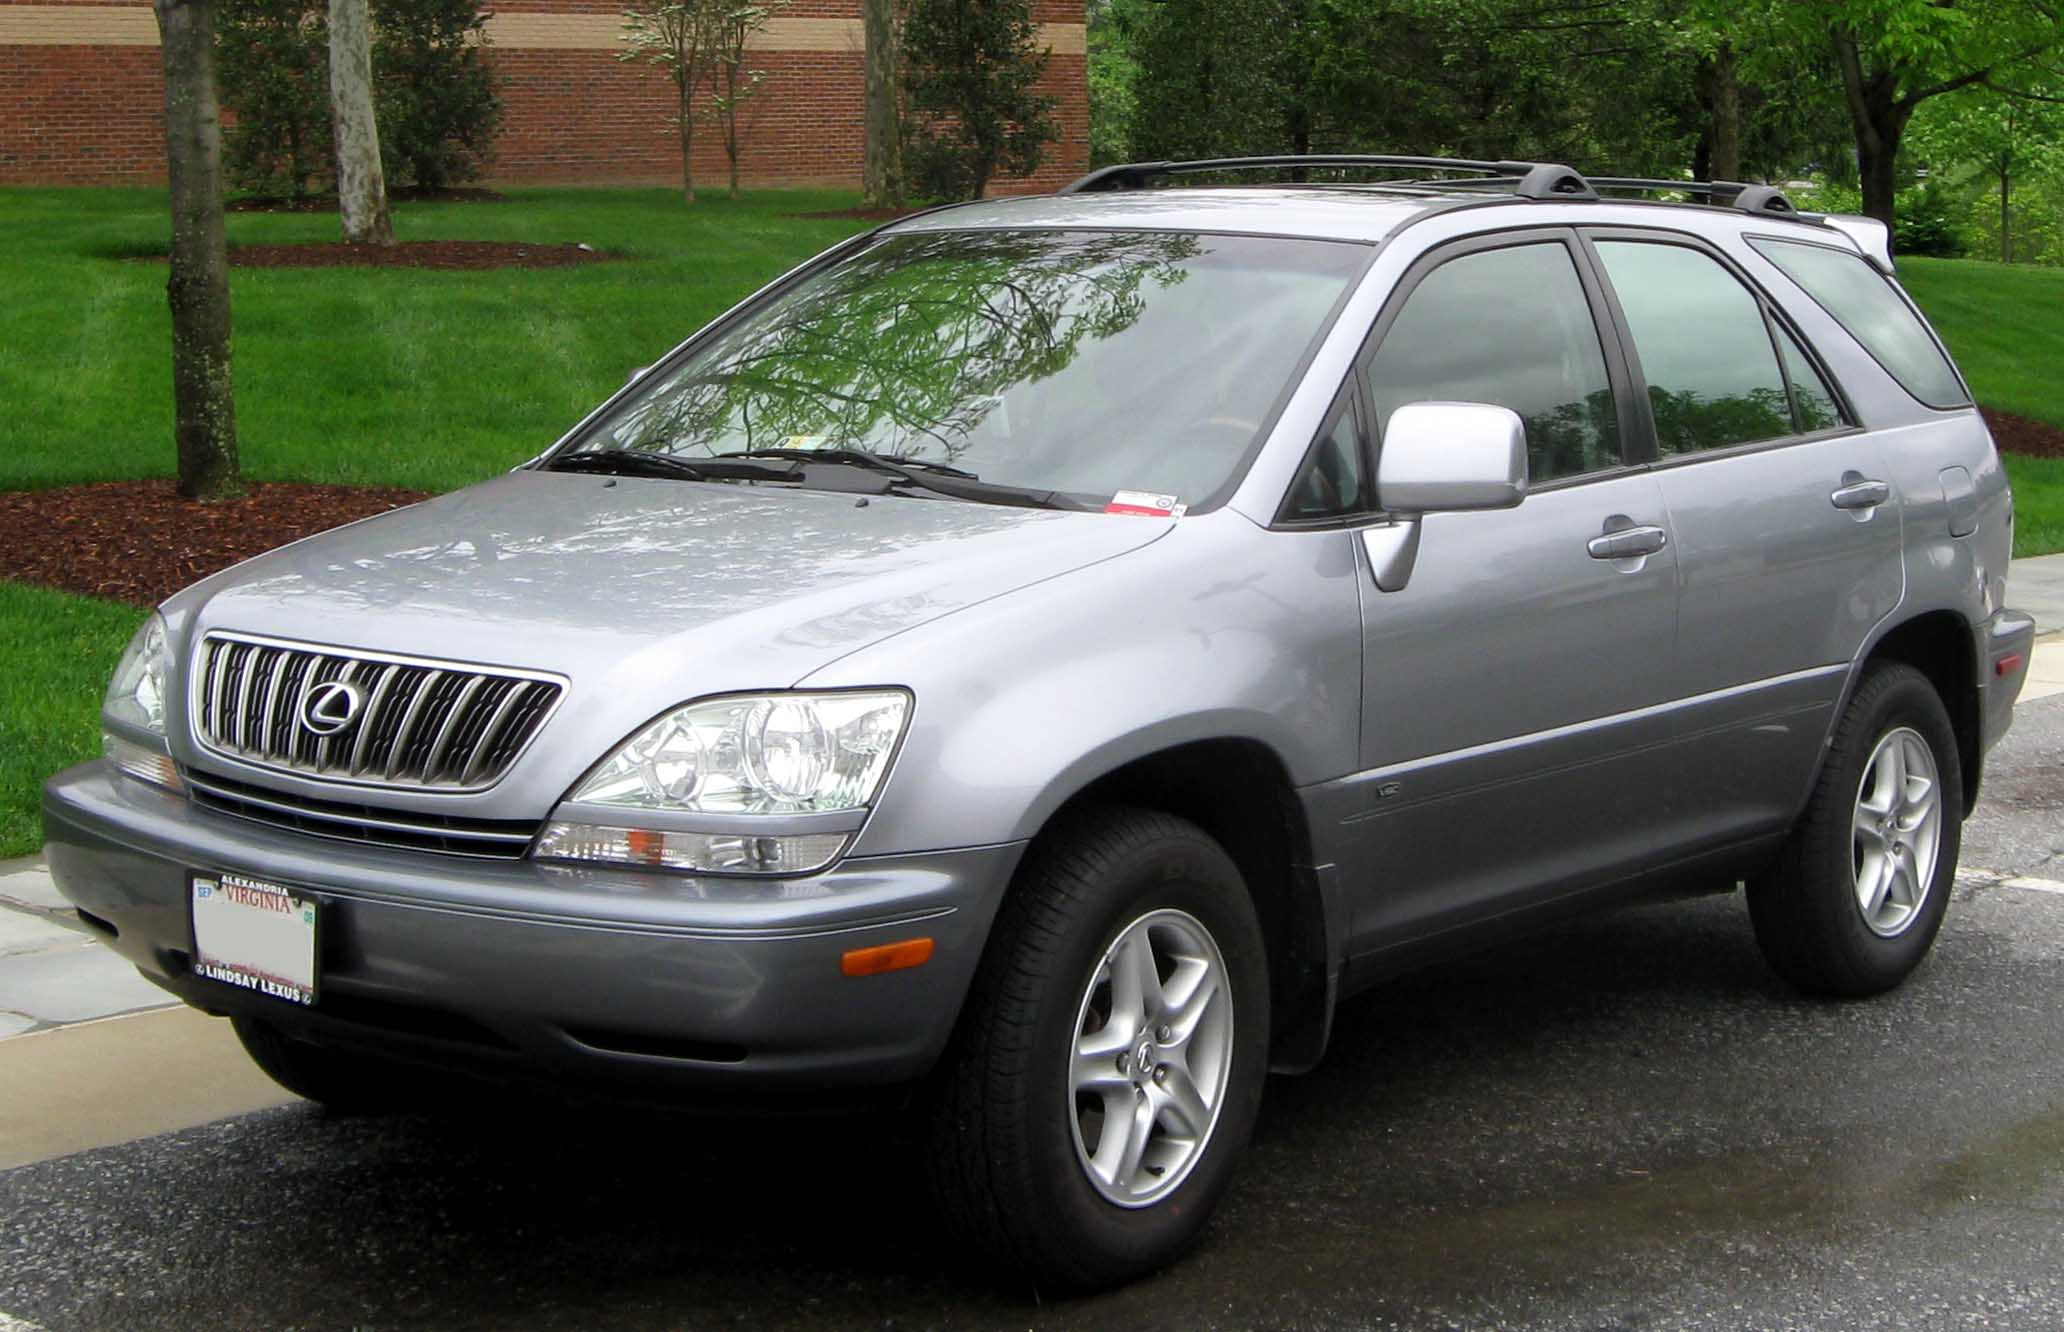 2001 lexus rx 300 14 lexus rx 300 14